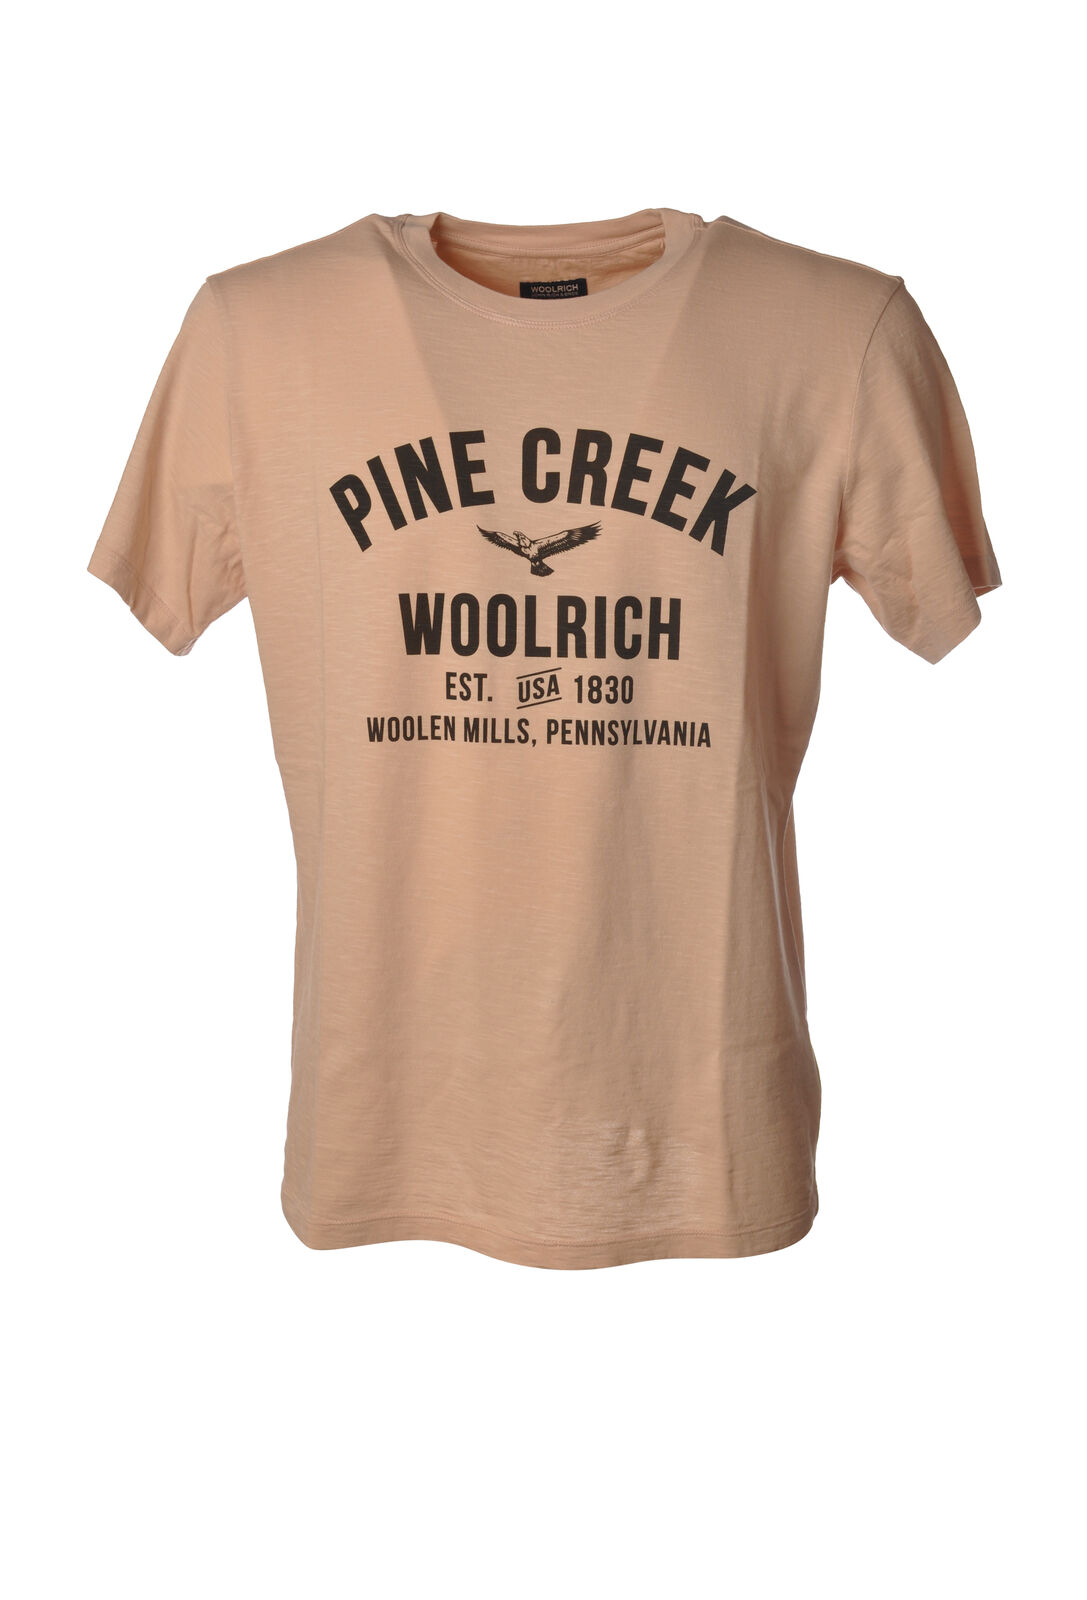 Woolrich - Topwear-T-shirts - Mann - pink - 6067018C191433